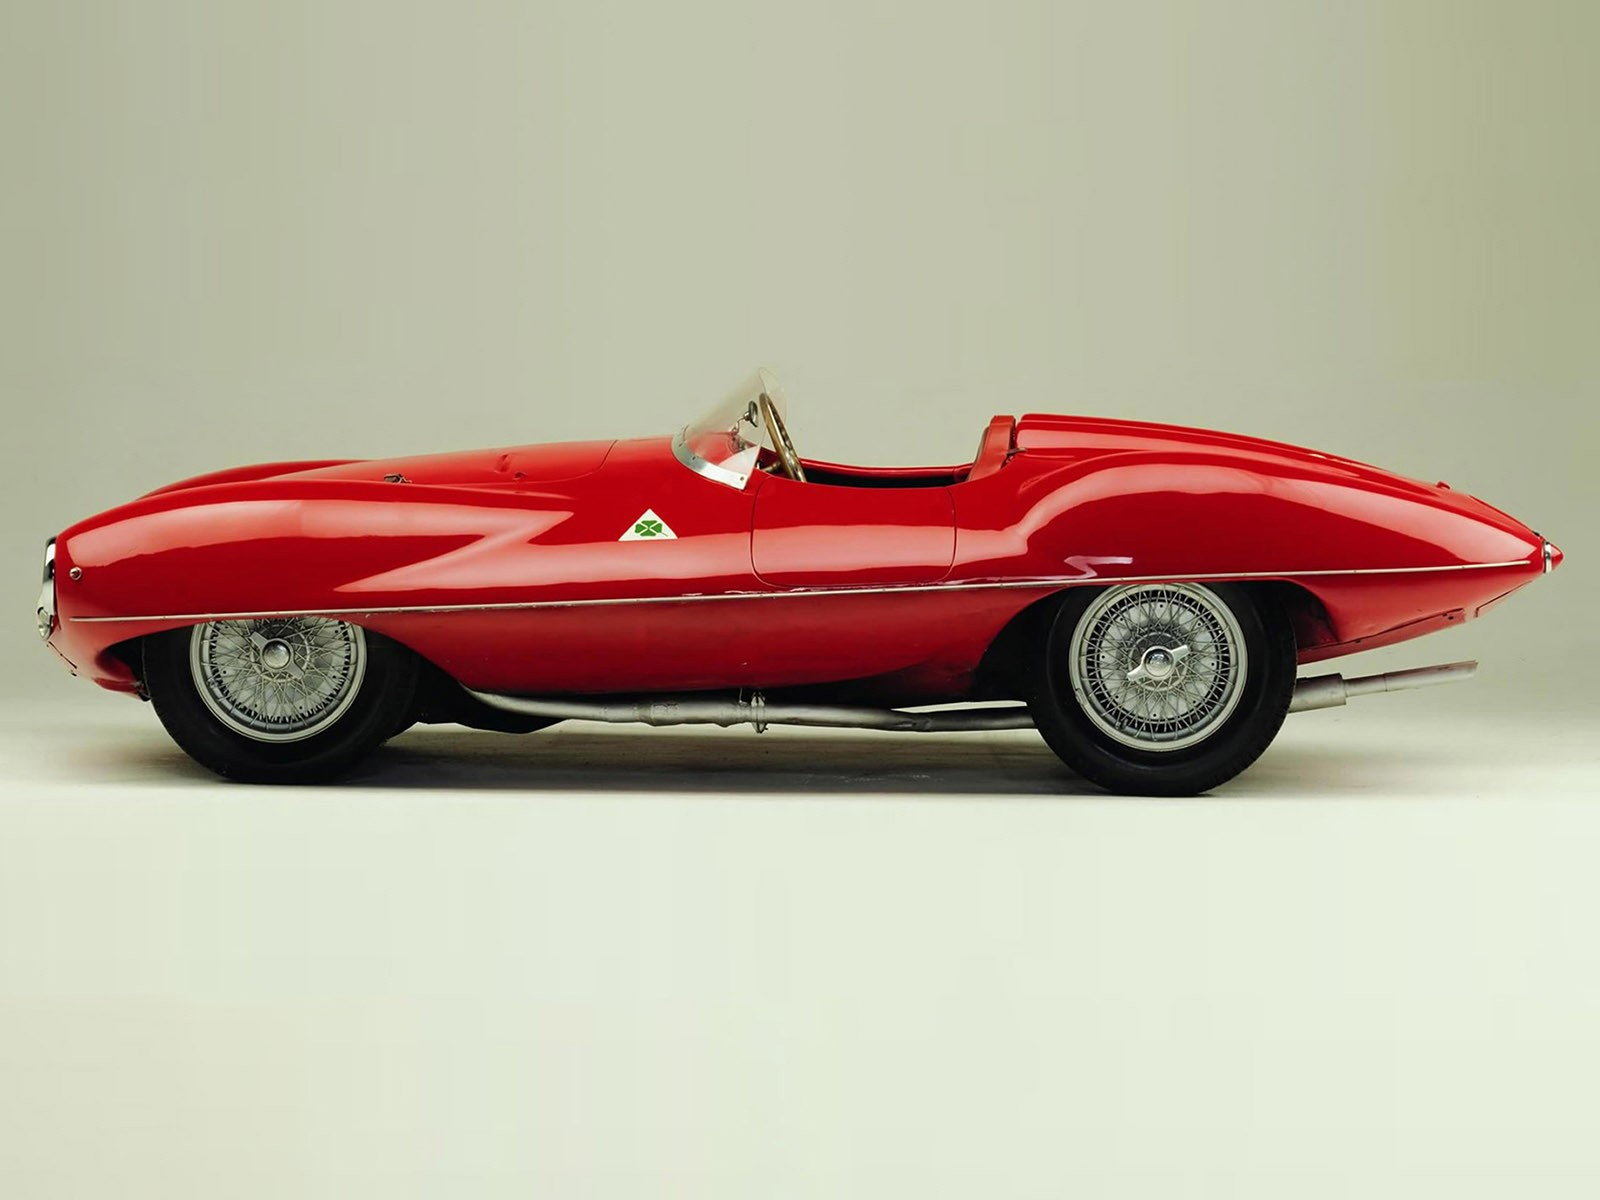 1952 Alfa-Romeo 1900 C52 Disco Volante Spider